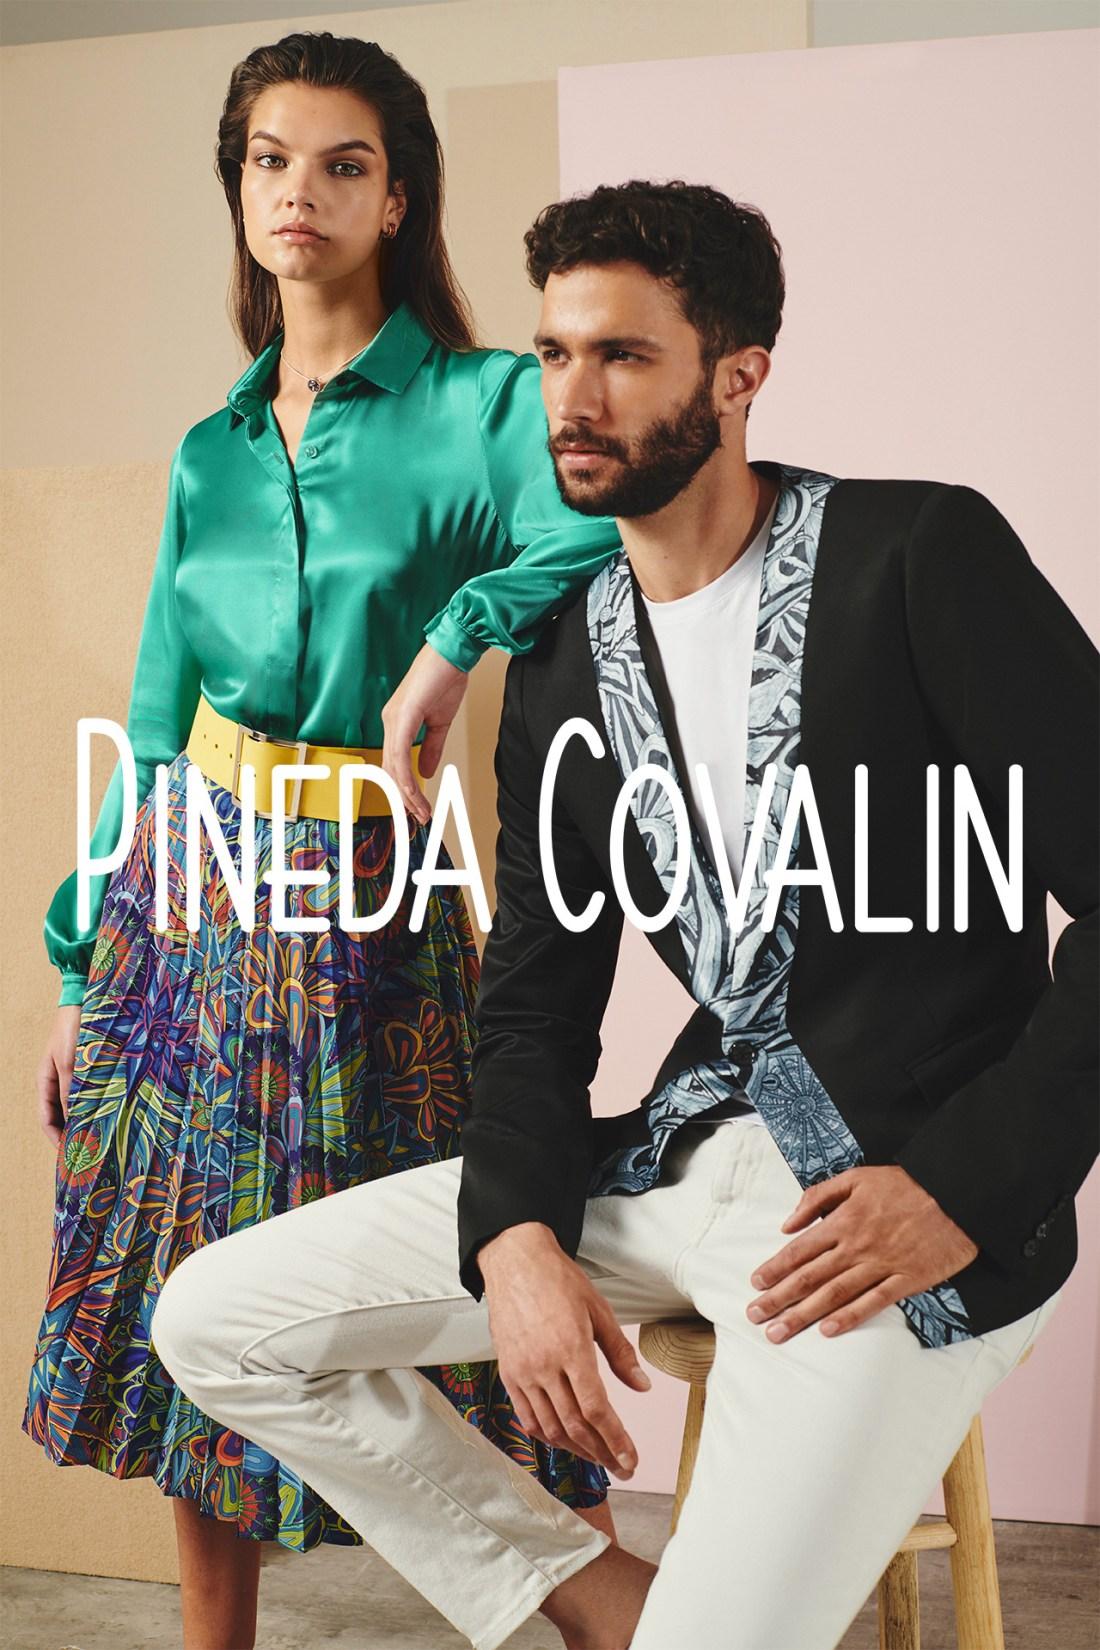 PinedaCovalin-13